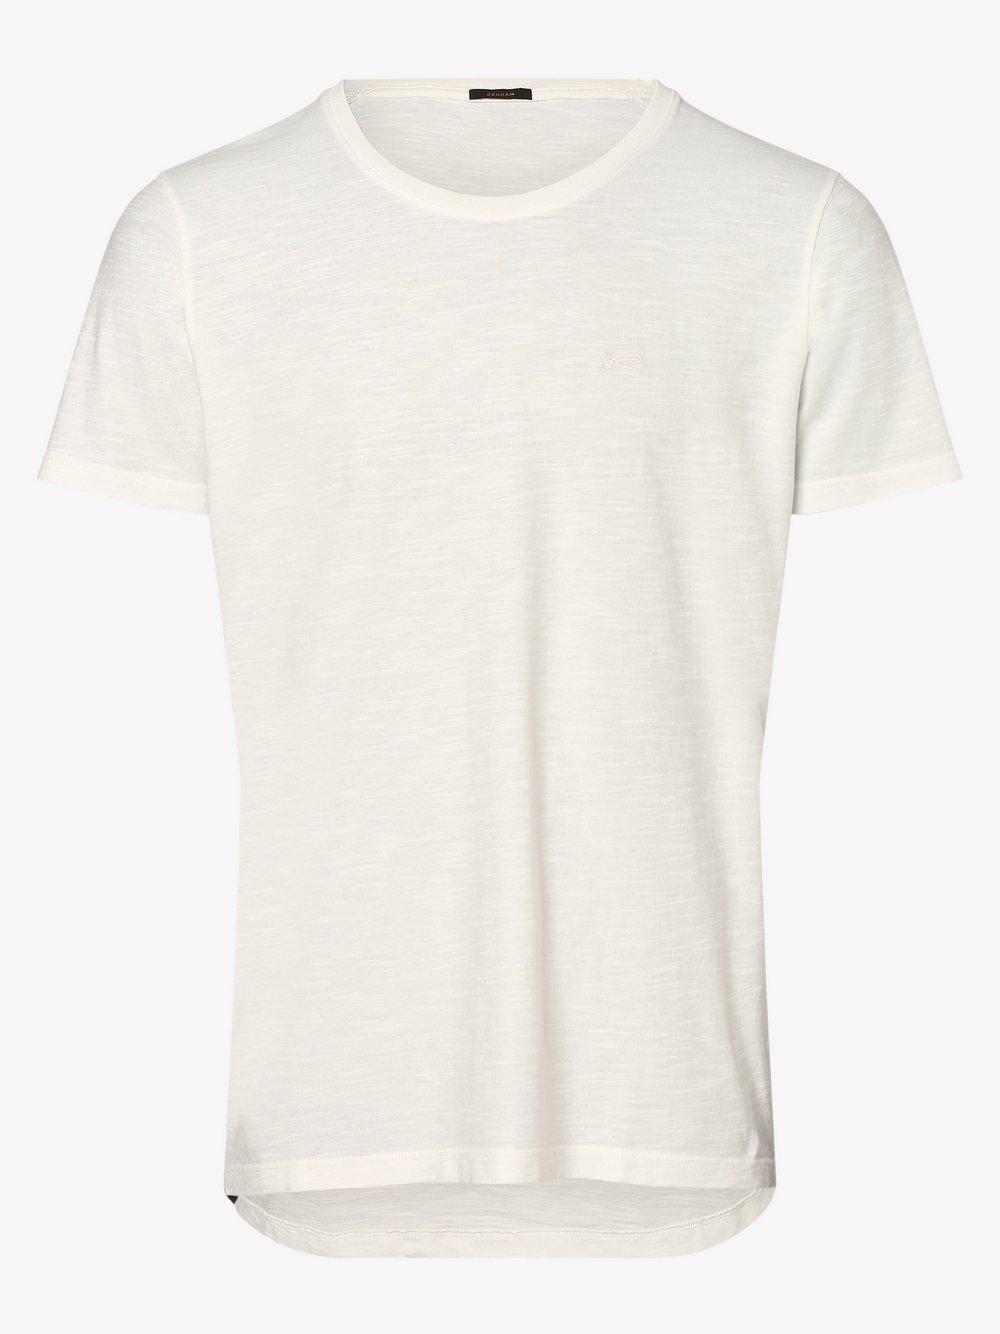 DENHAM – T-shirt męski, biały Van Graaf 473196-0001-09970